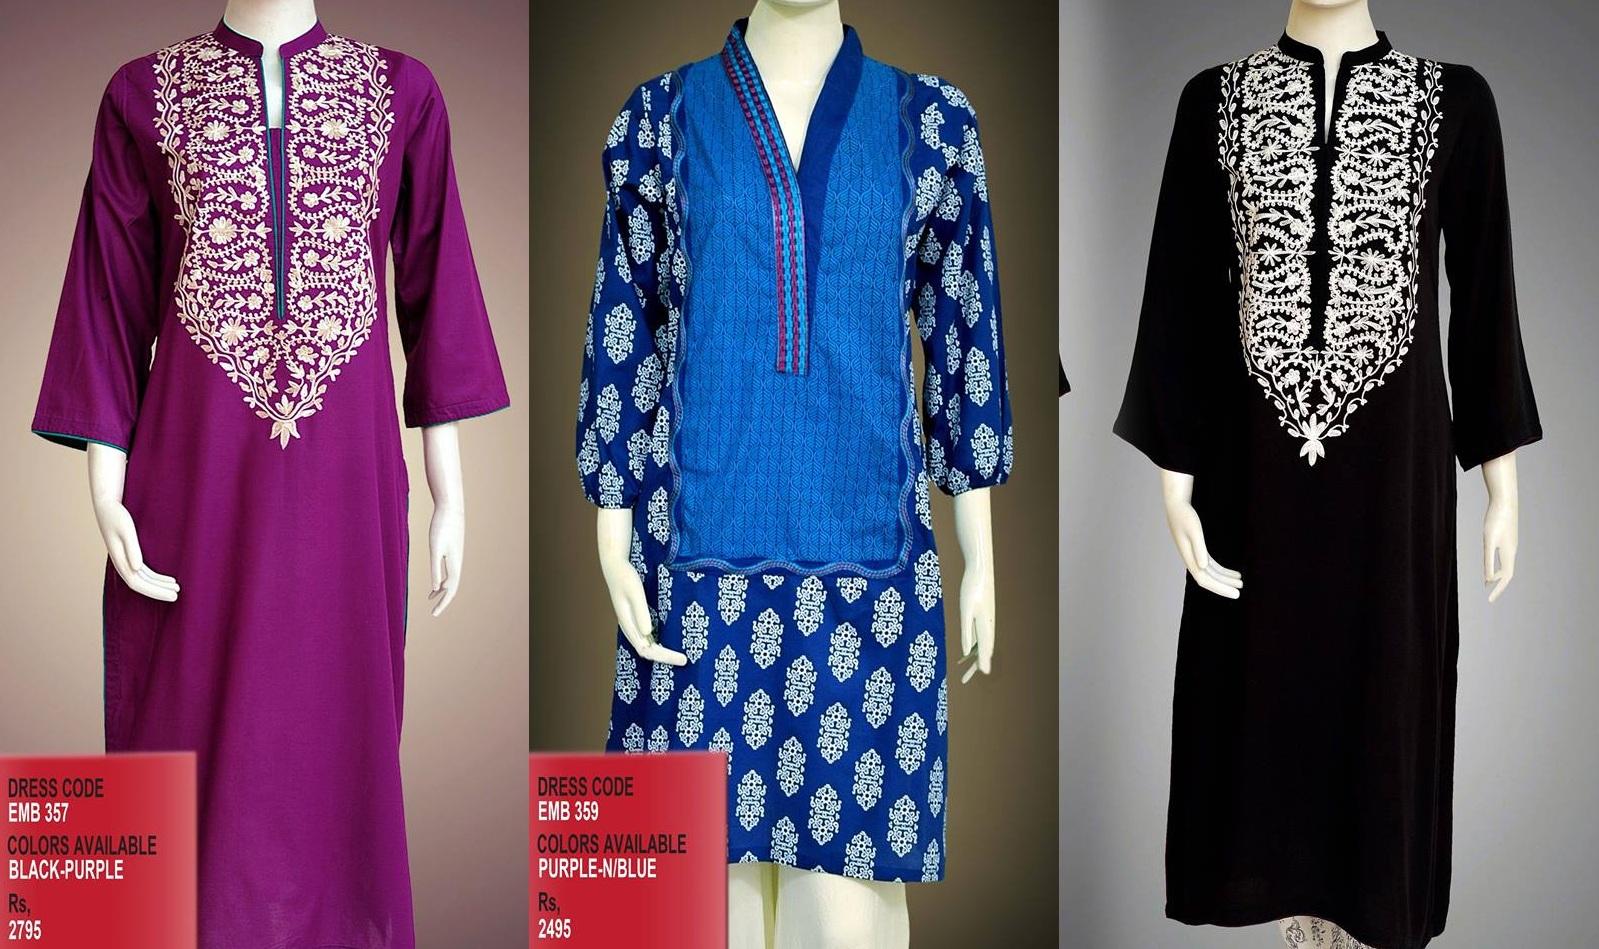 Latest Styles & Designs of Women Kurtas 2016-17 by Change